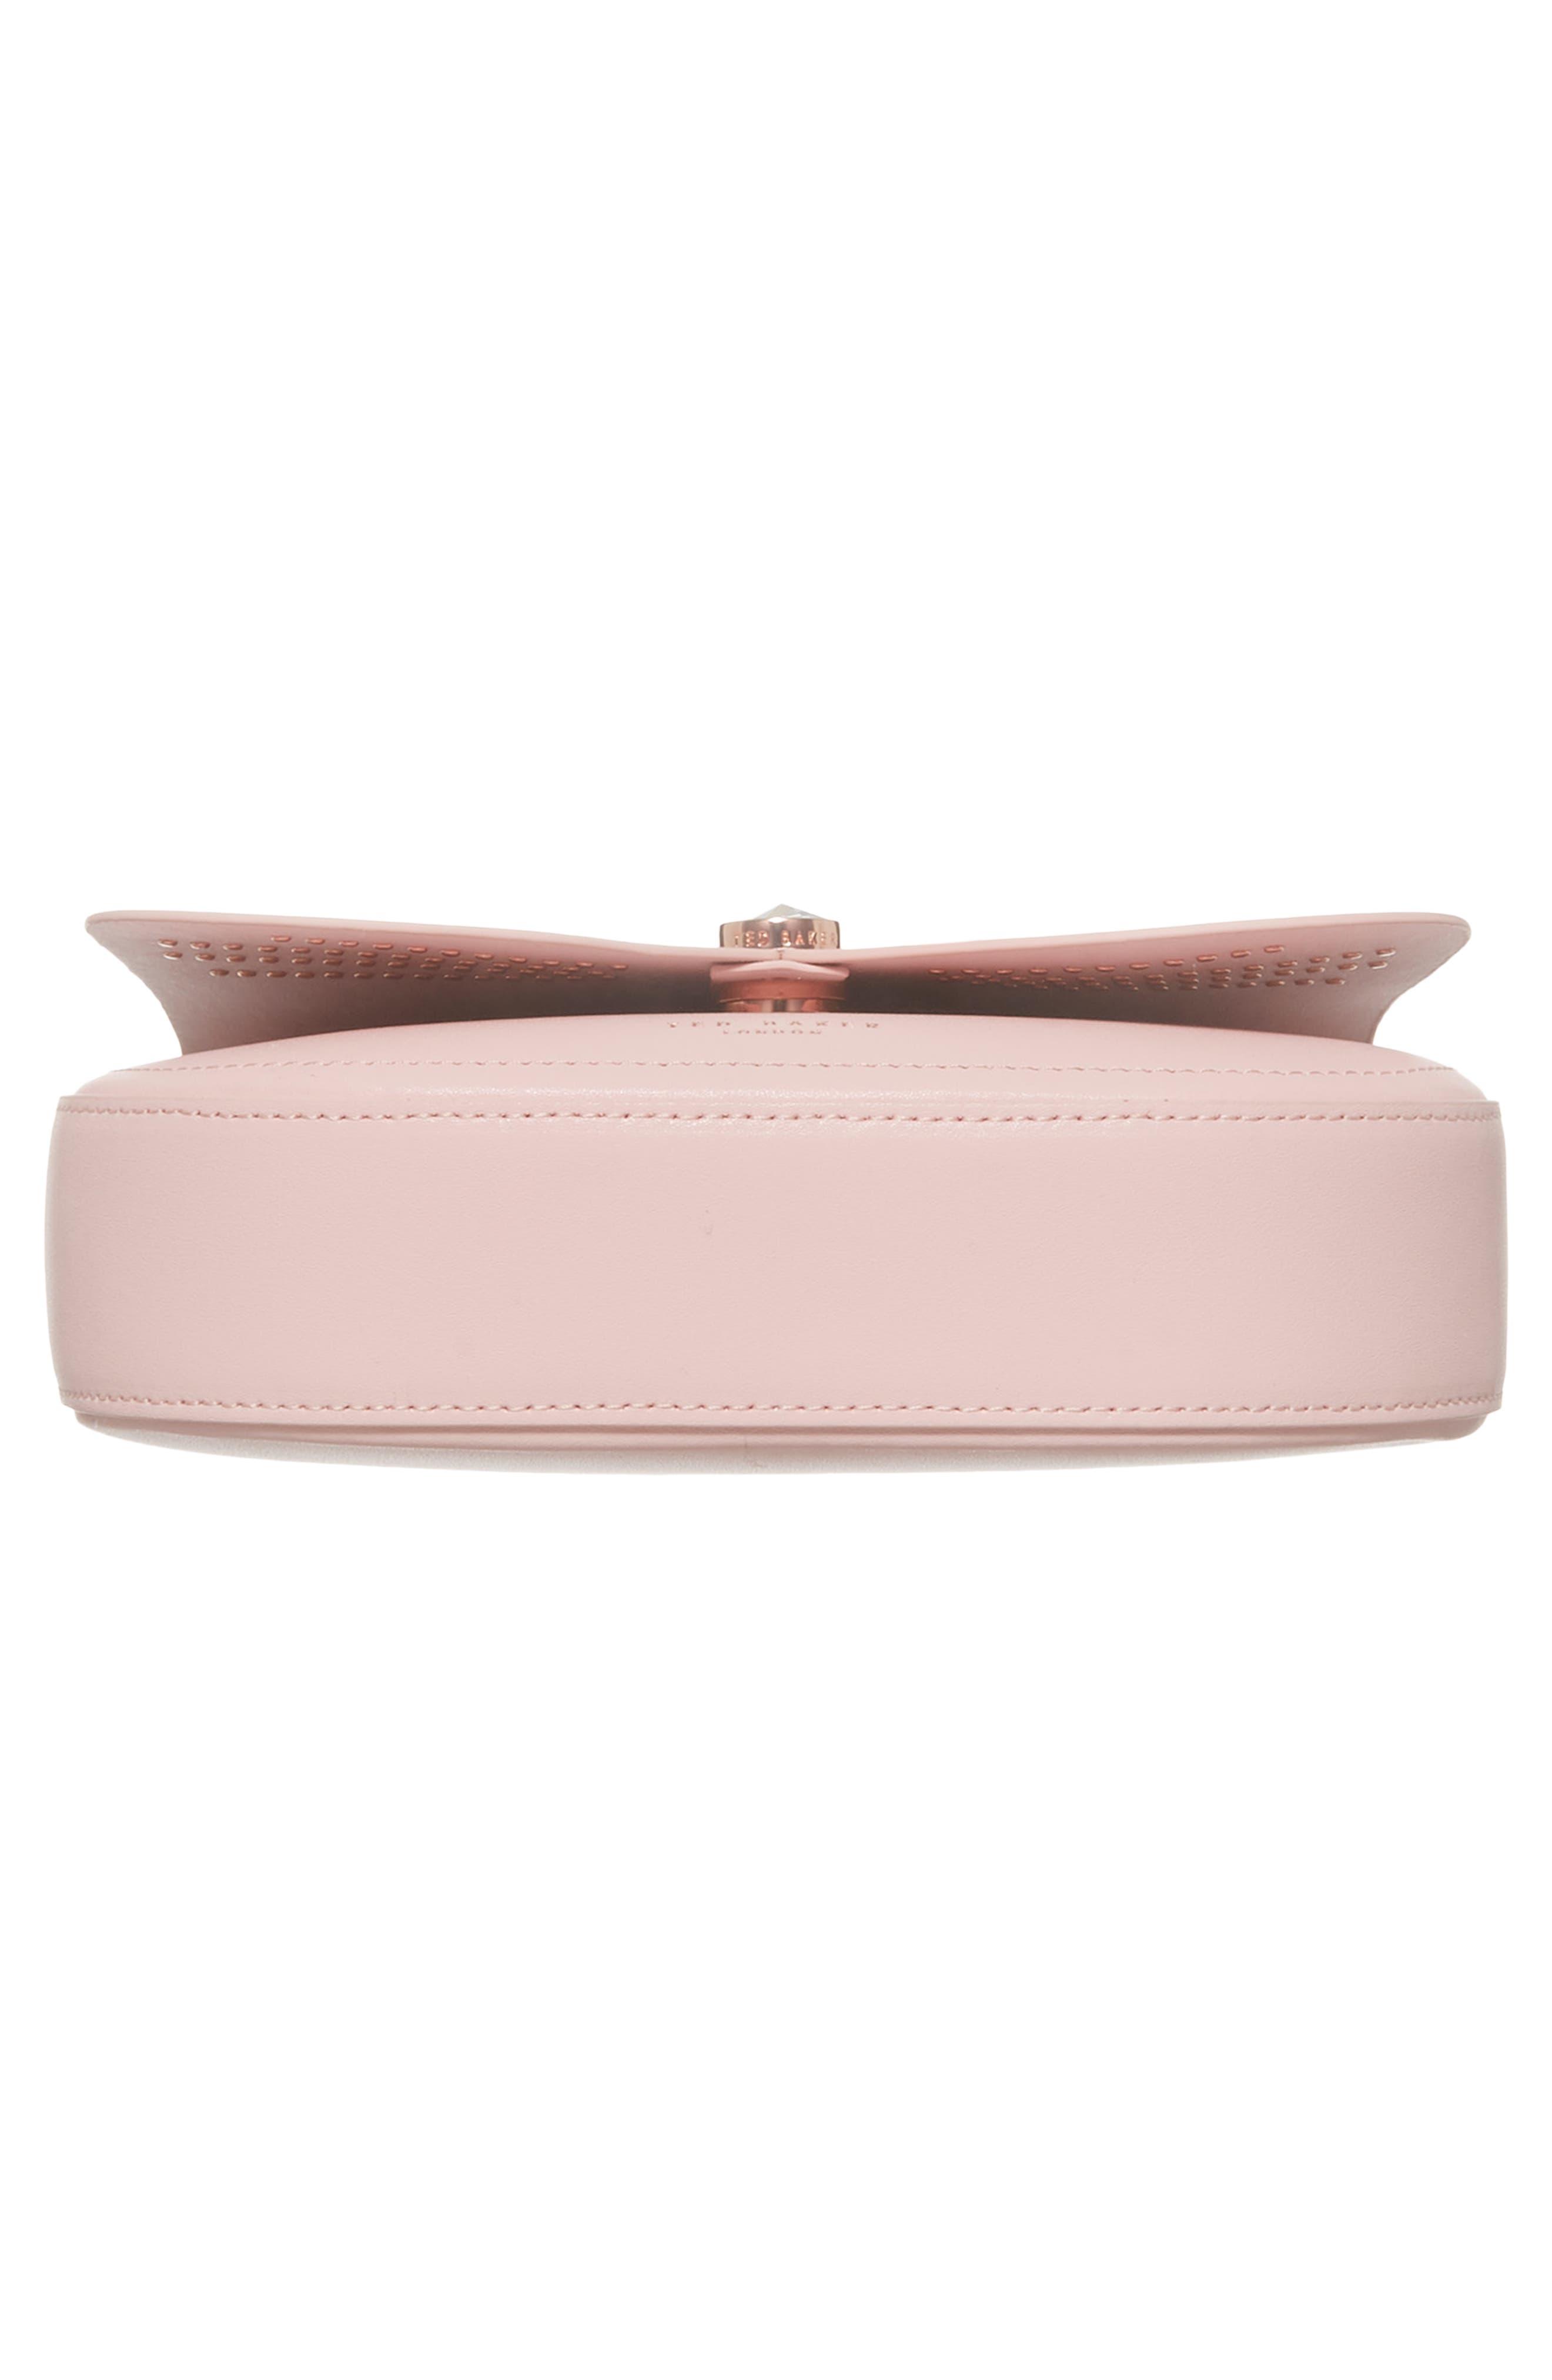 Chriiss Cat Stud Leather Crossbody Bag,                             Alternate thumbnail 17, color,